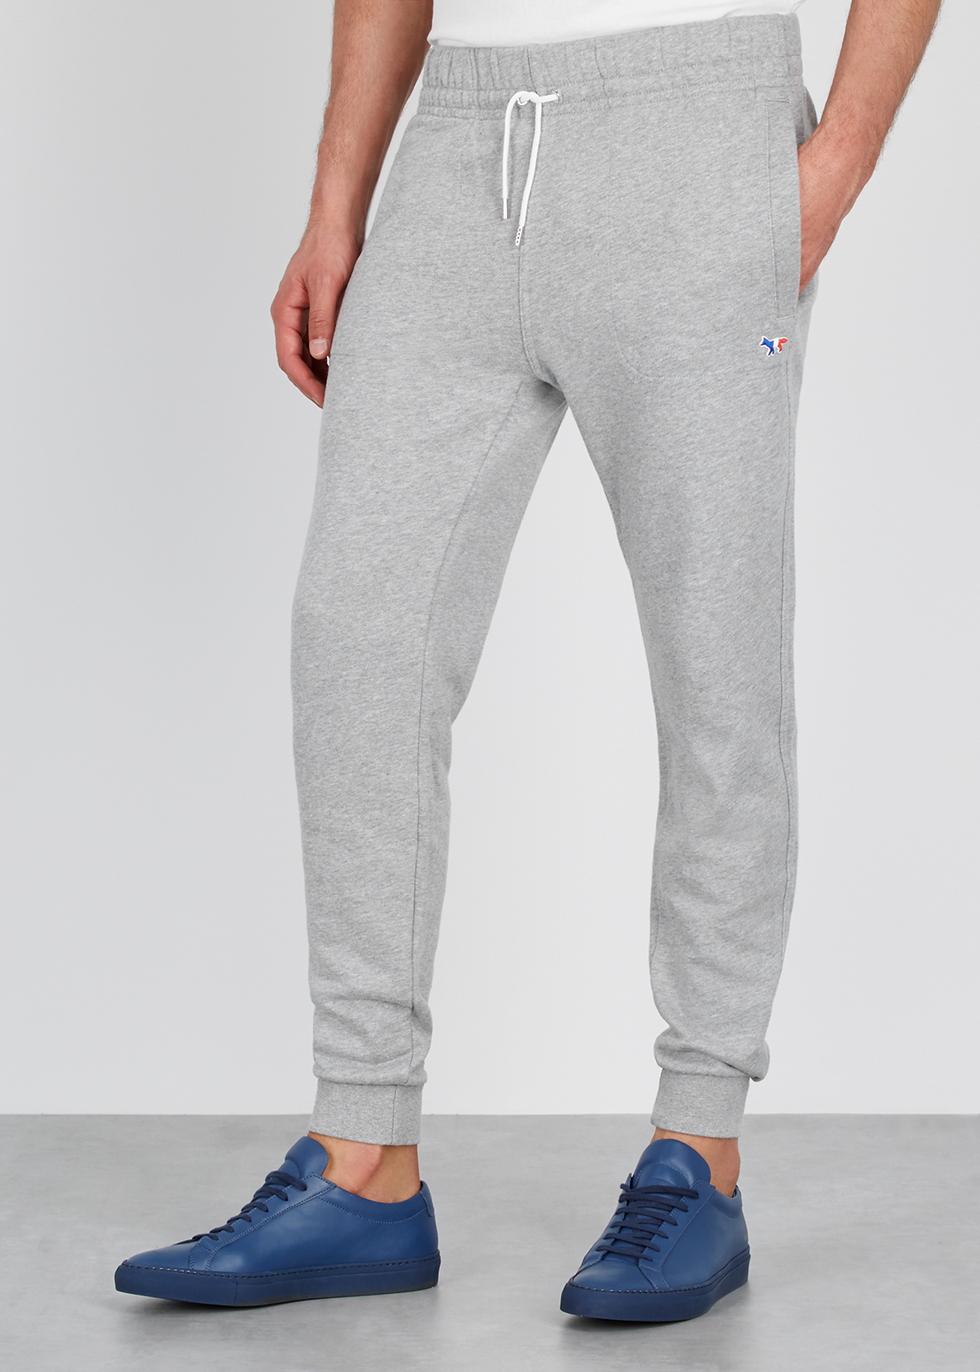 Light grey cotton sweatpants - Maison Kitsuné